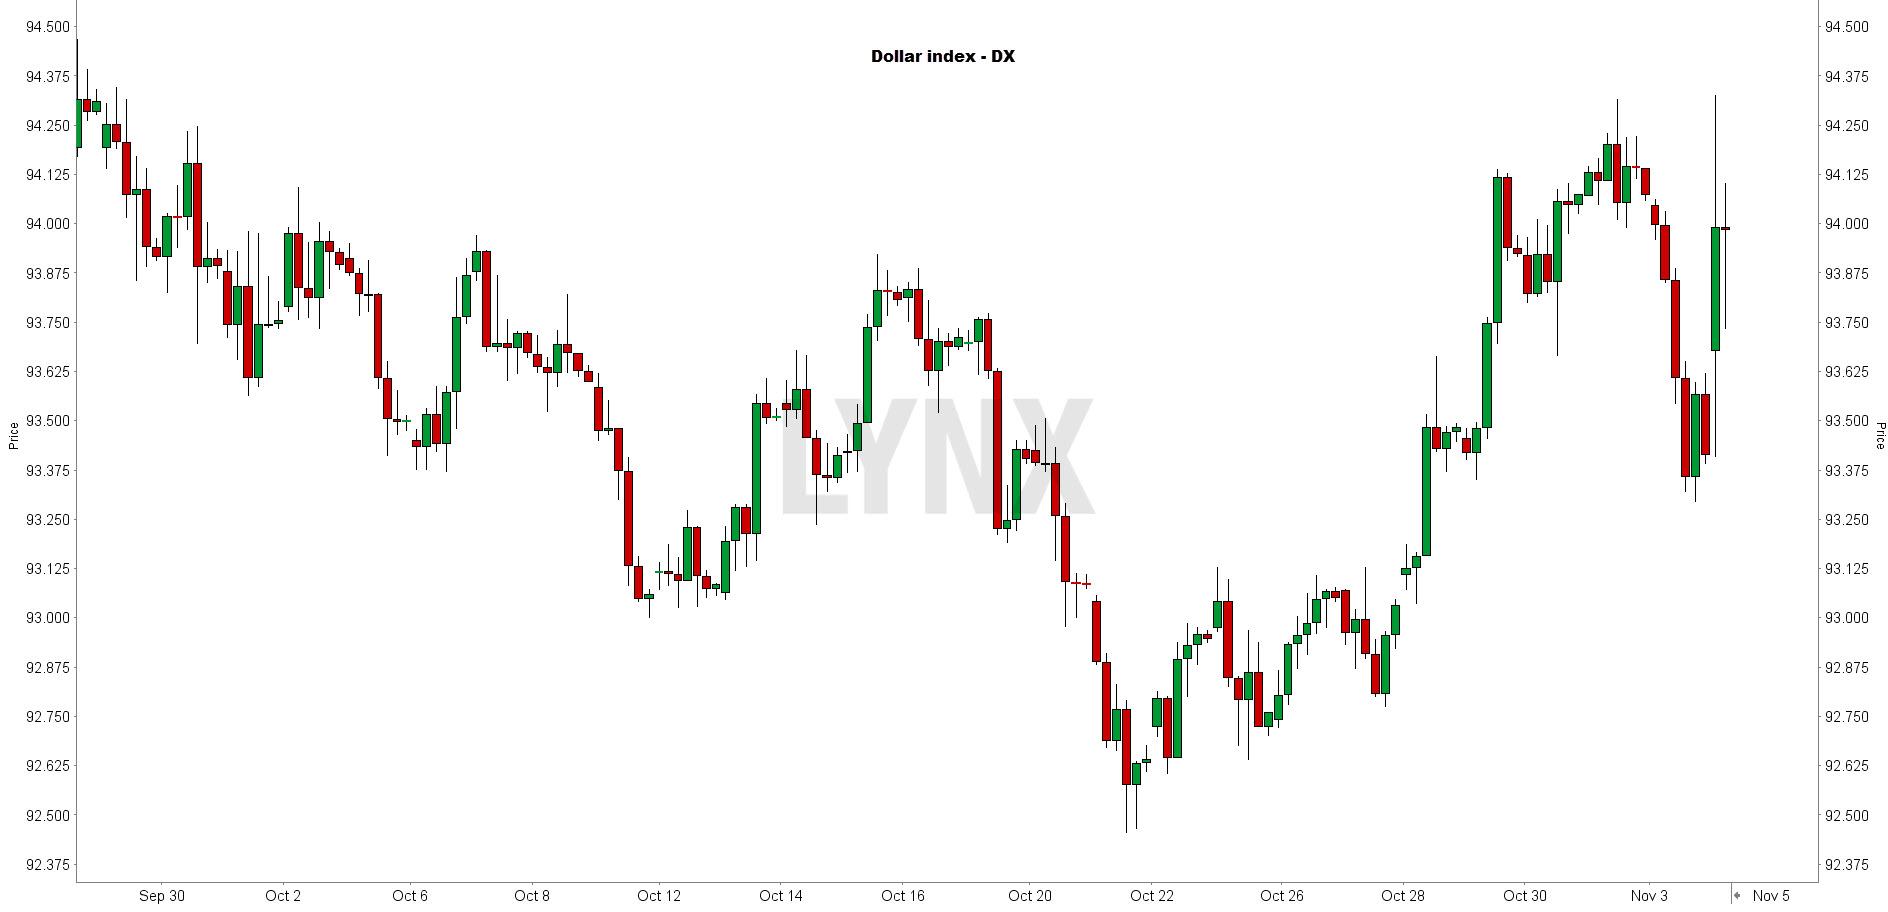 koers dollar index